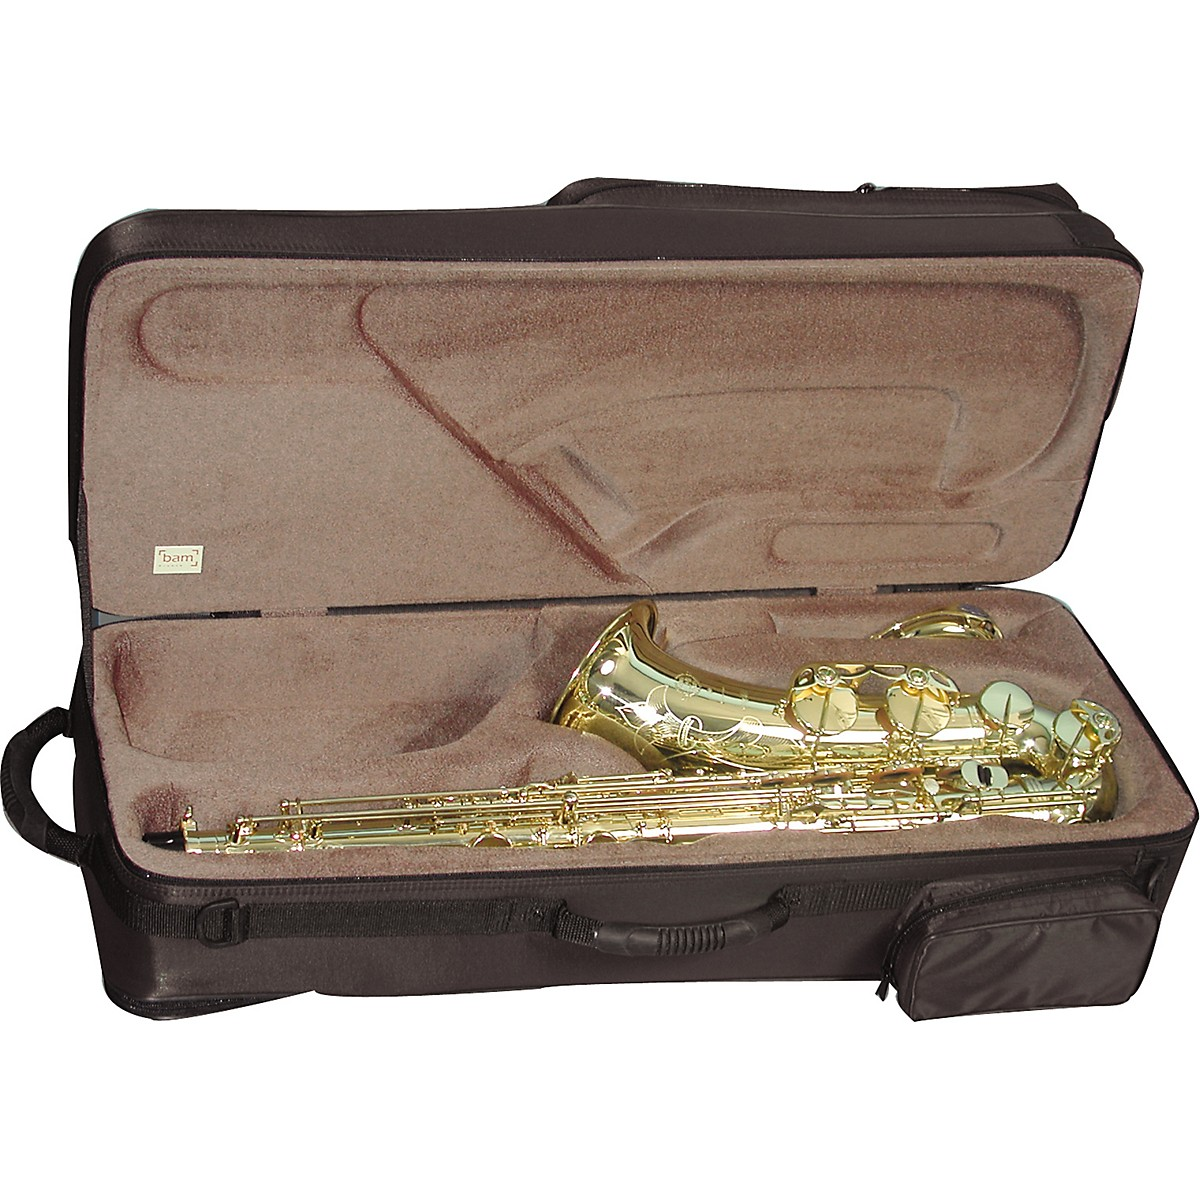 Bam Tenor Sax Trekking Cases